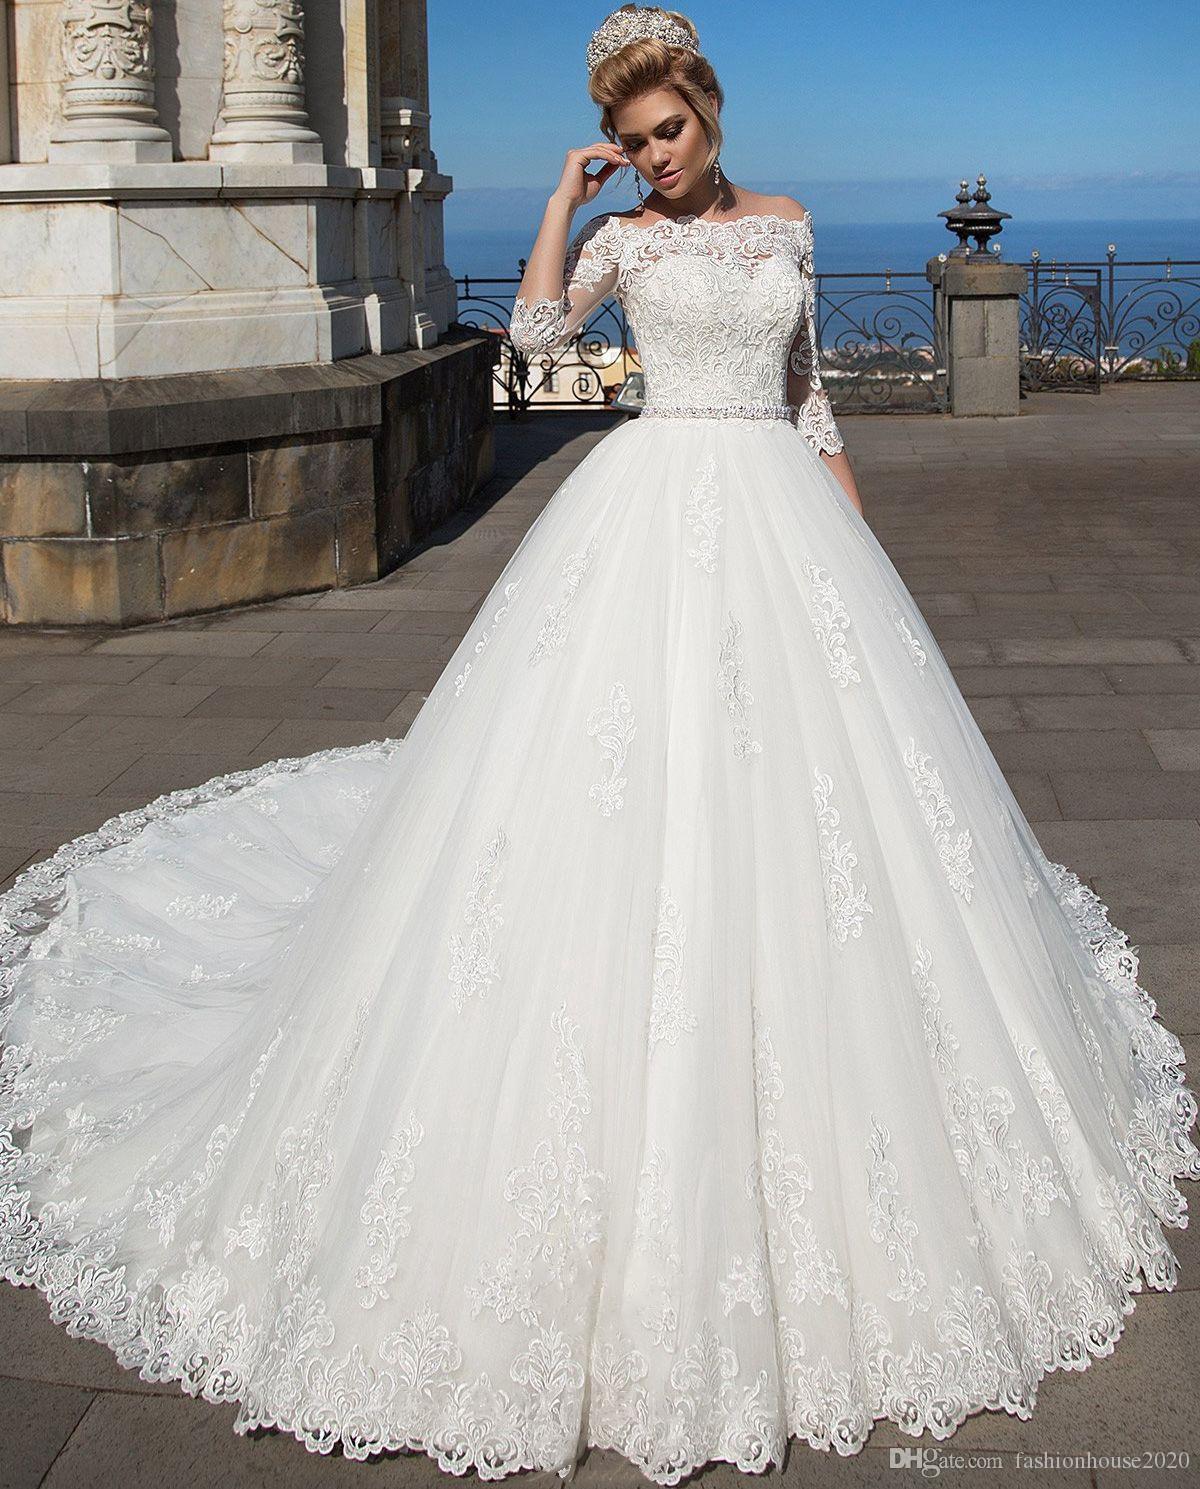 2020 Cheap Elegant Ball Gown Wedding Dresses Off Shoulder Princess Lace  Applique Long Sleeves Plus Size Wedding Dress Bridal Gowns Custom Wedding  ...